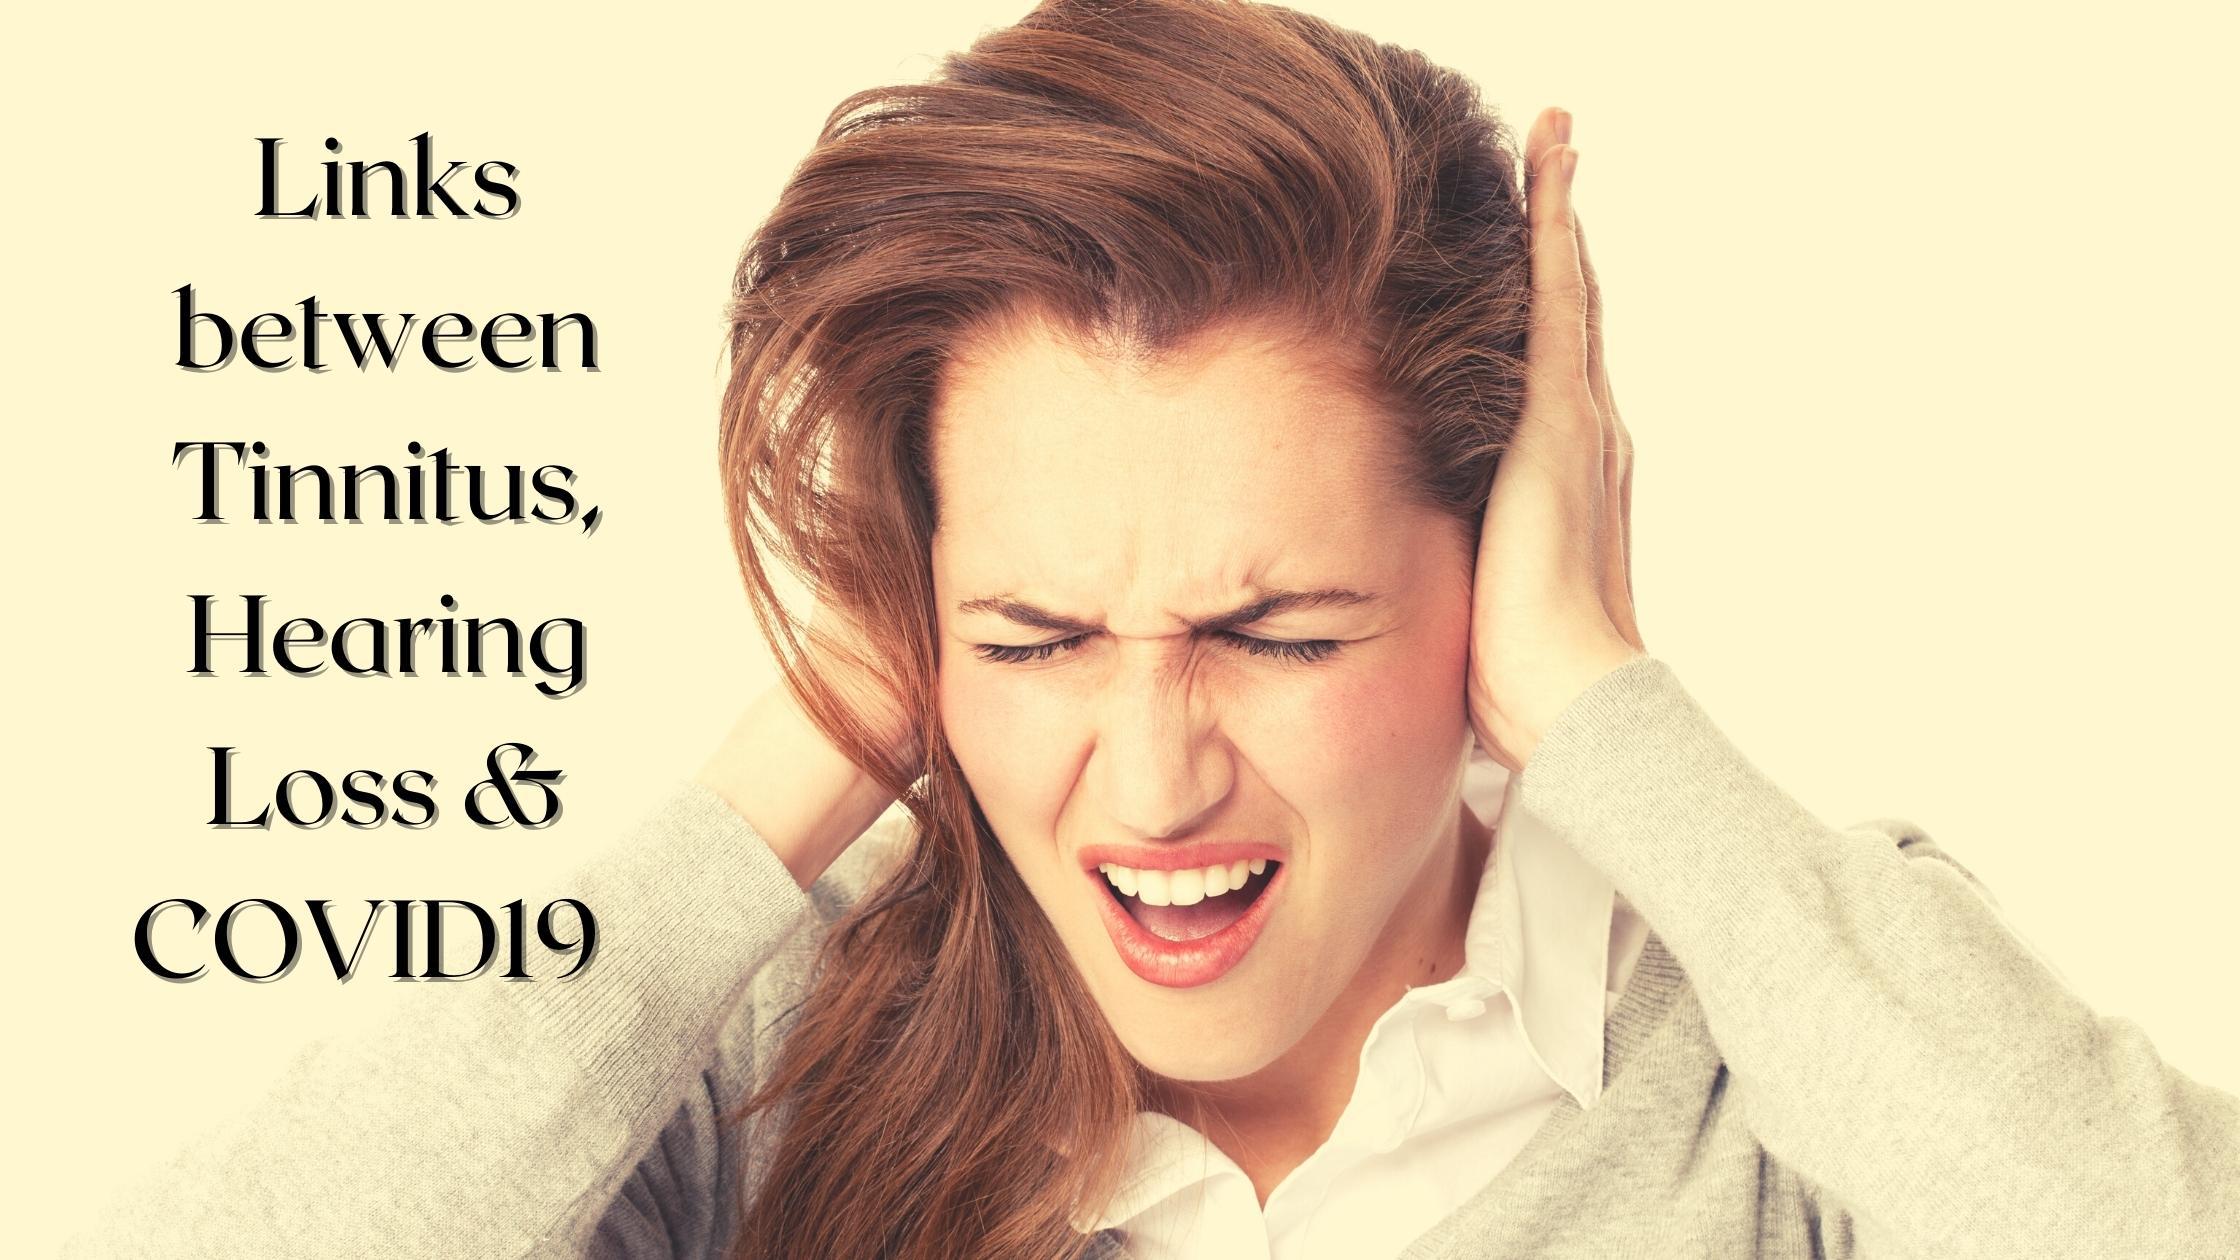 Links between Tinnitus, Hearing Loss & COVID19